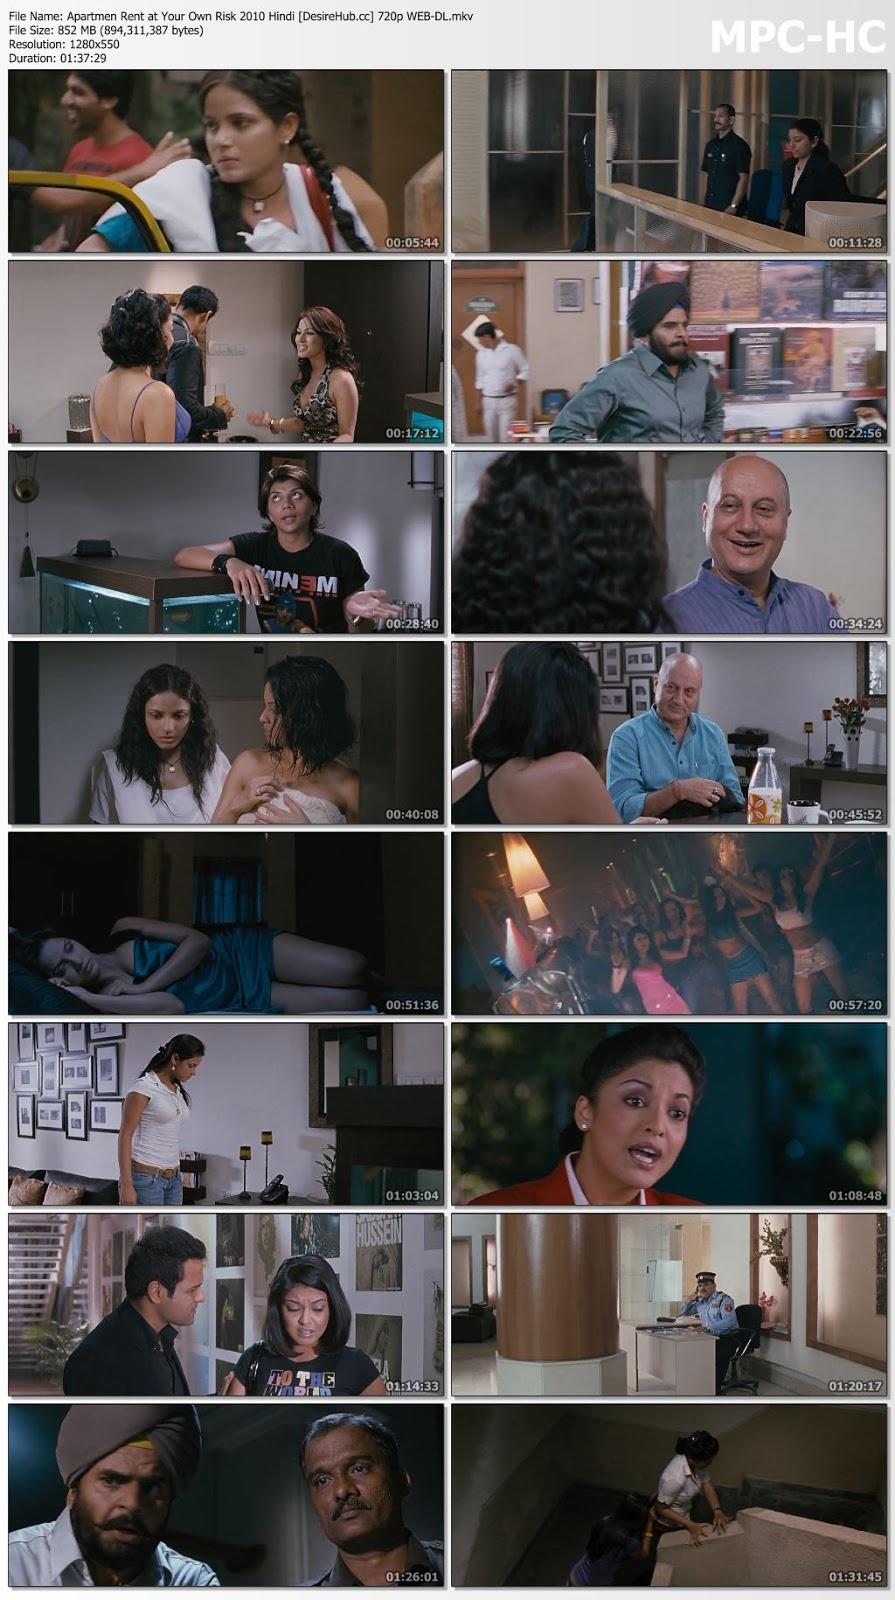 Apartmen Rent at Your Own Risk 2010 Hindi 480p WEB-DL 300MB Desirehub